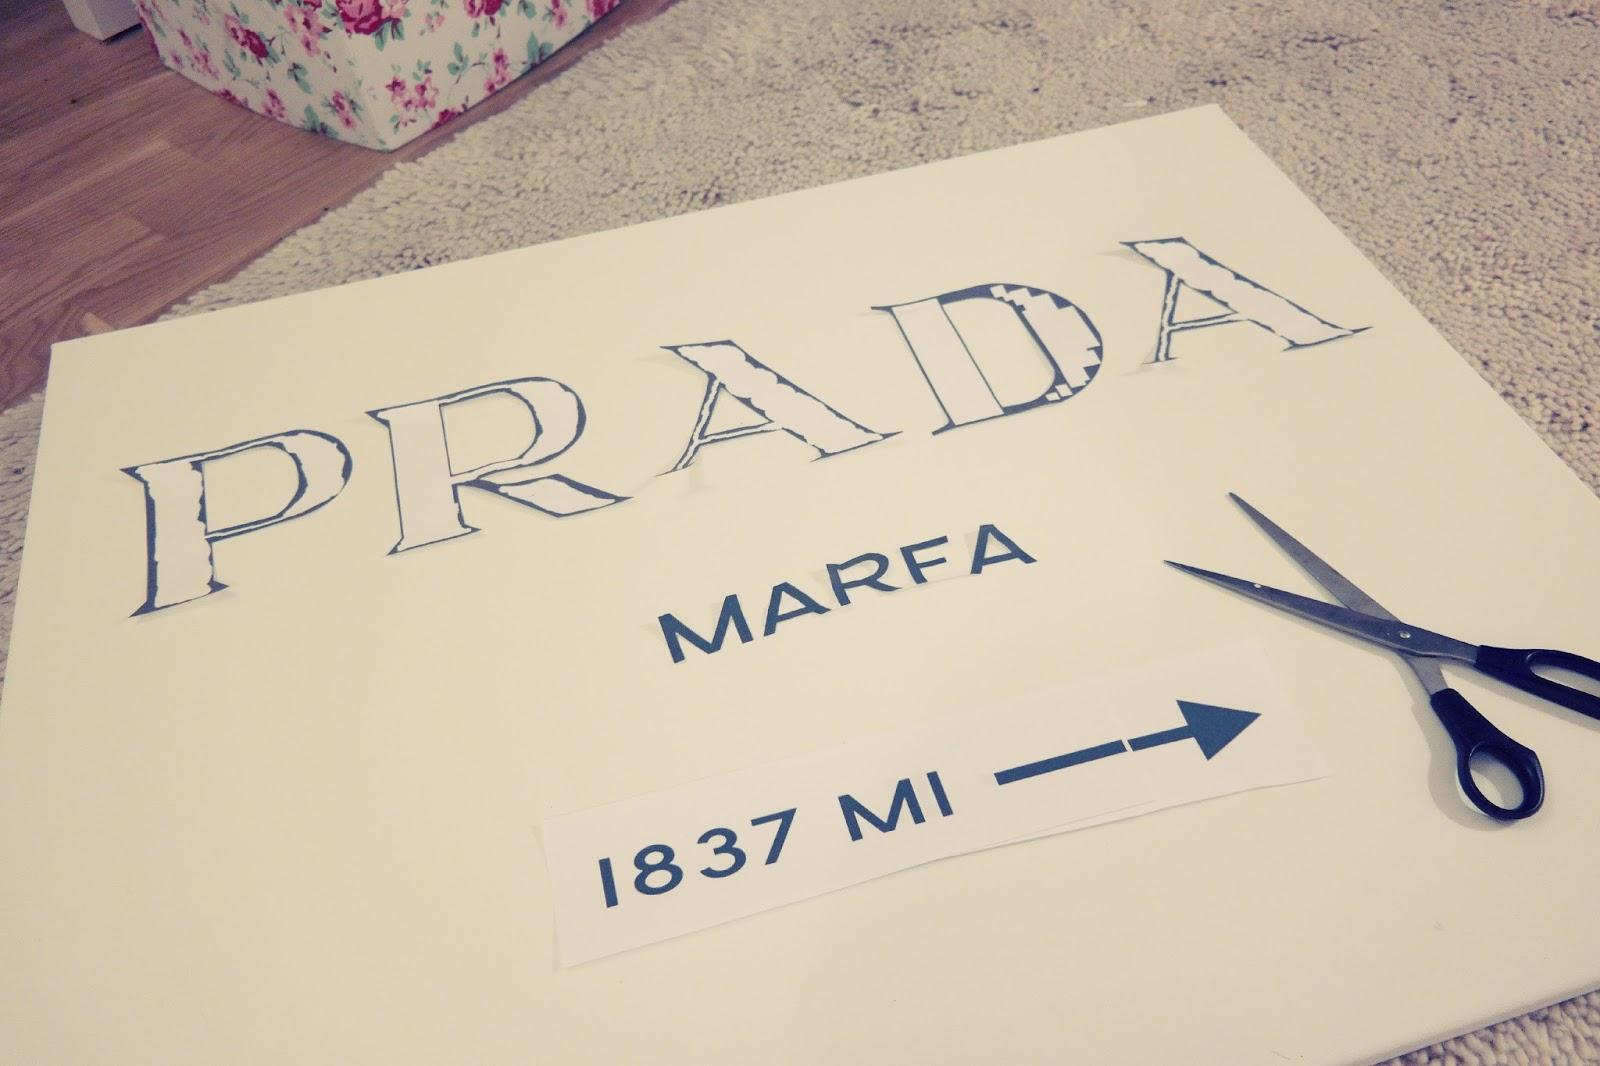 diy prada marfa bild by gossip girl selber machen tutorial neuer blog. Black Bedroom Furniture Sets. Home Design Ideas